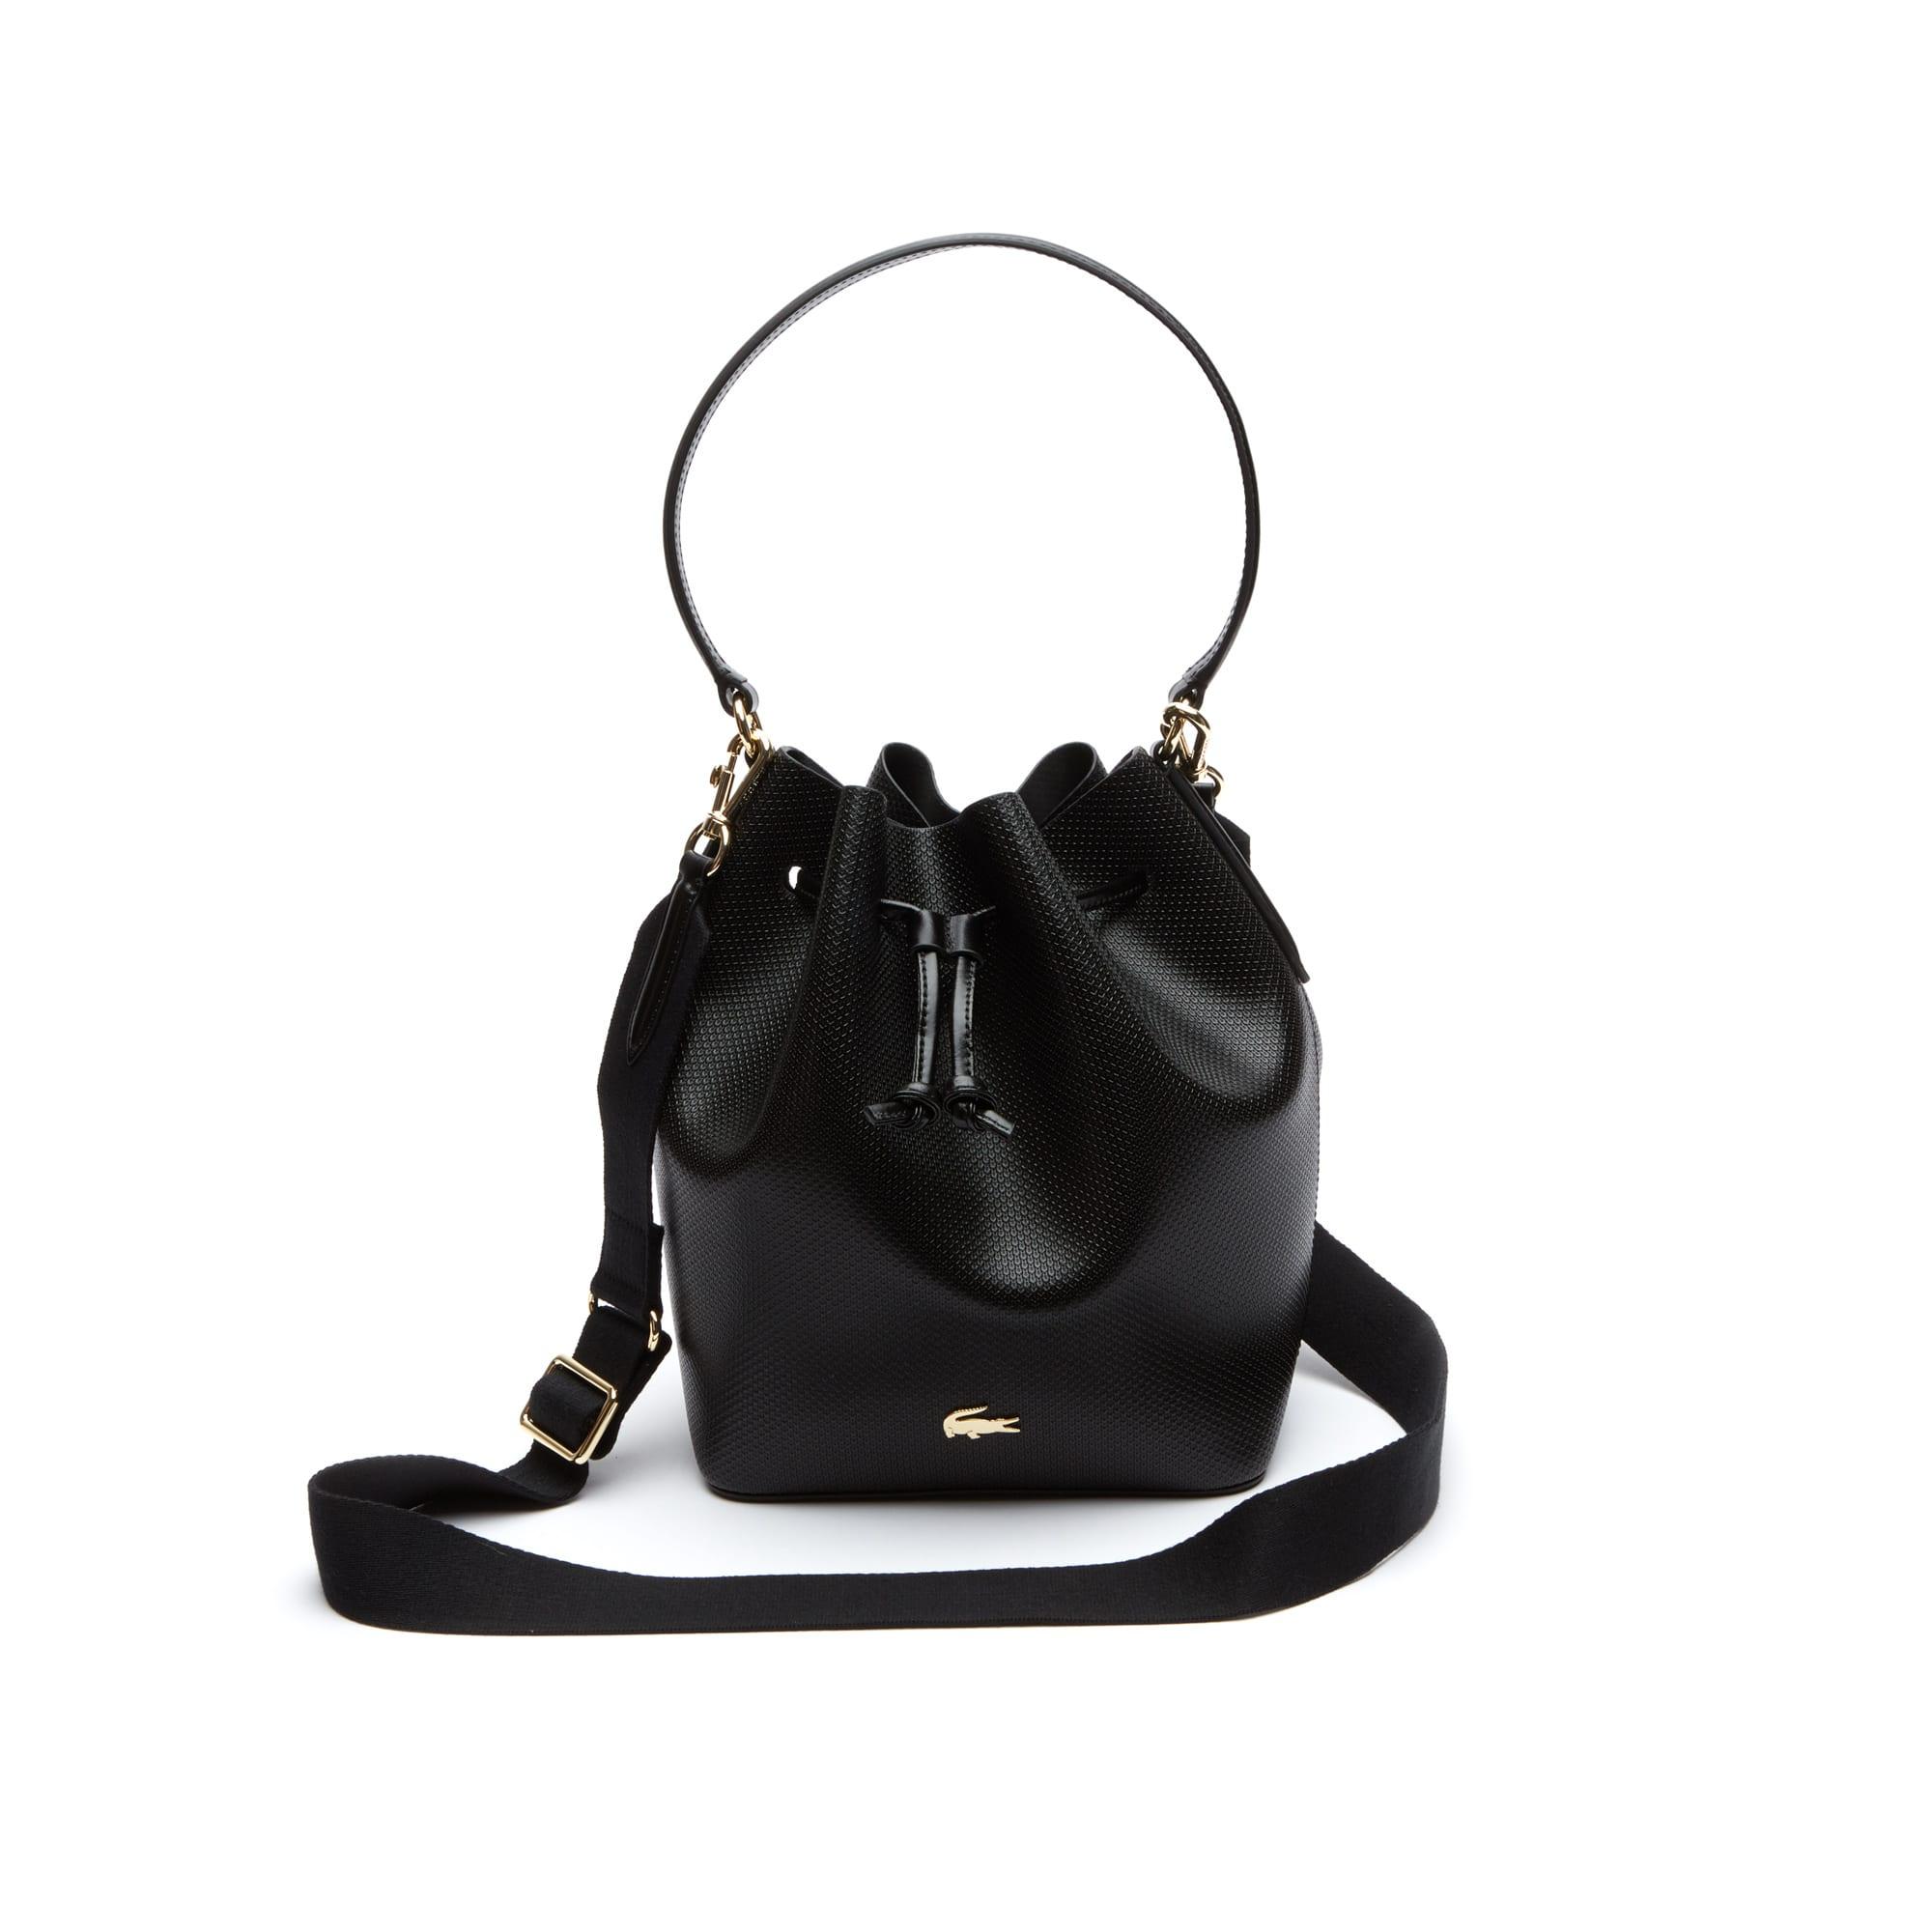 Women's Chantaco Dual Carry Piqué Leather Bucket Bag